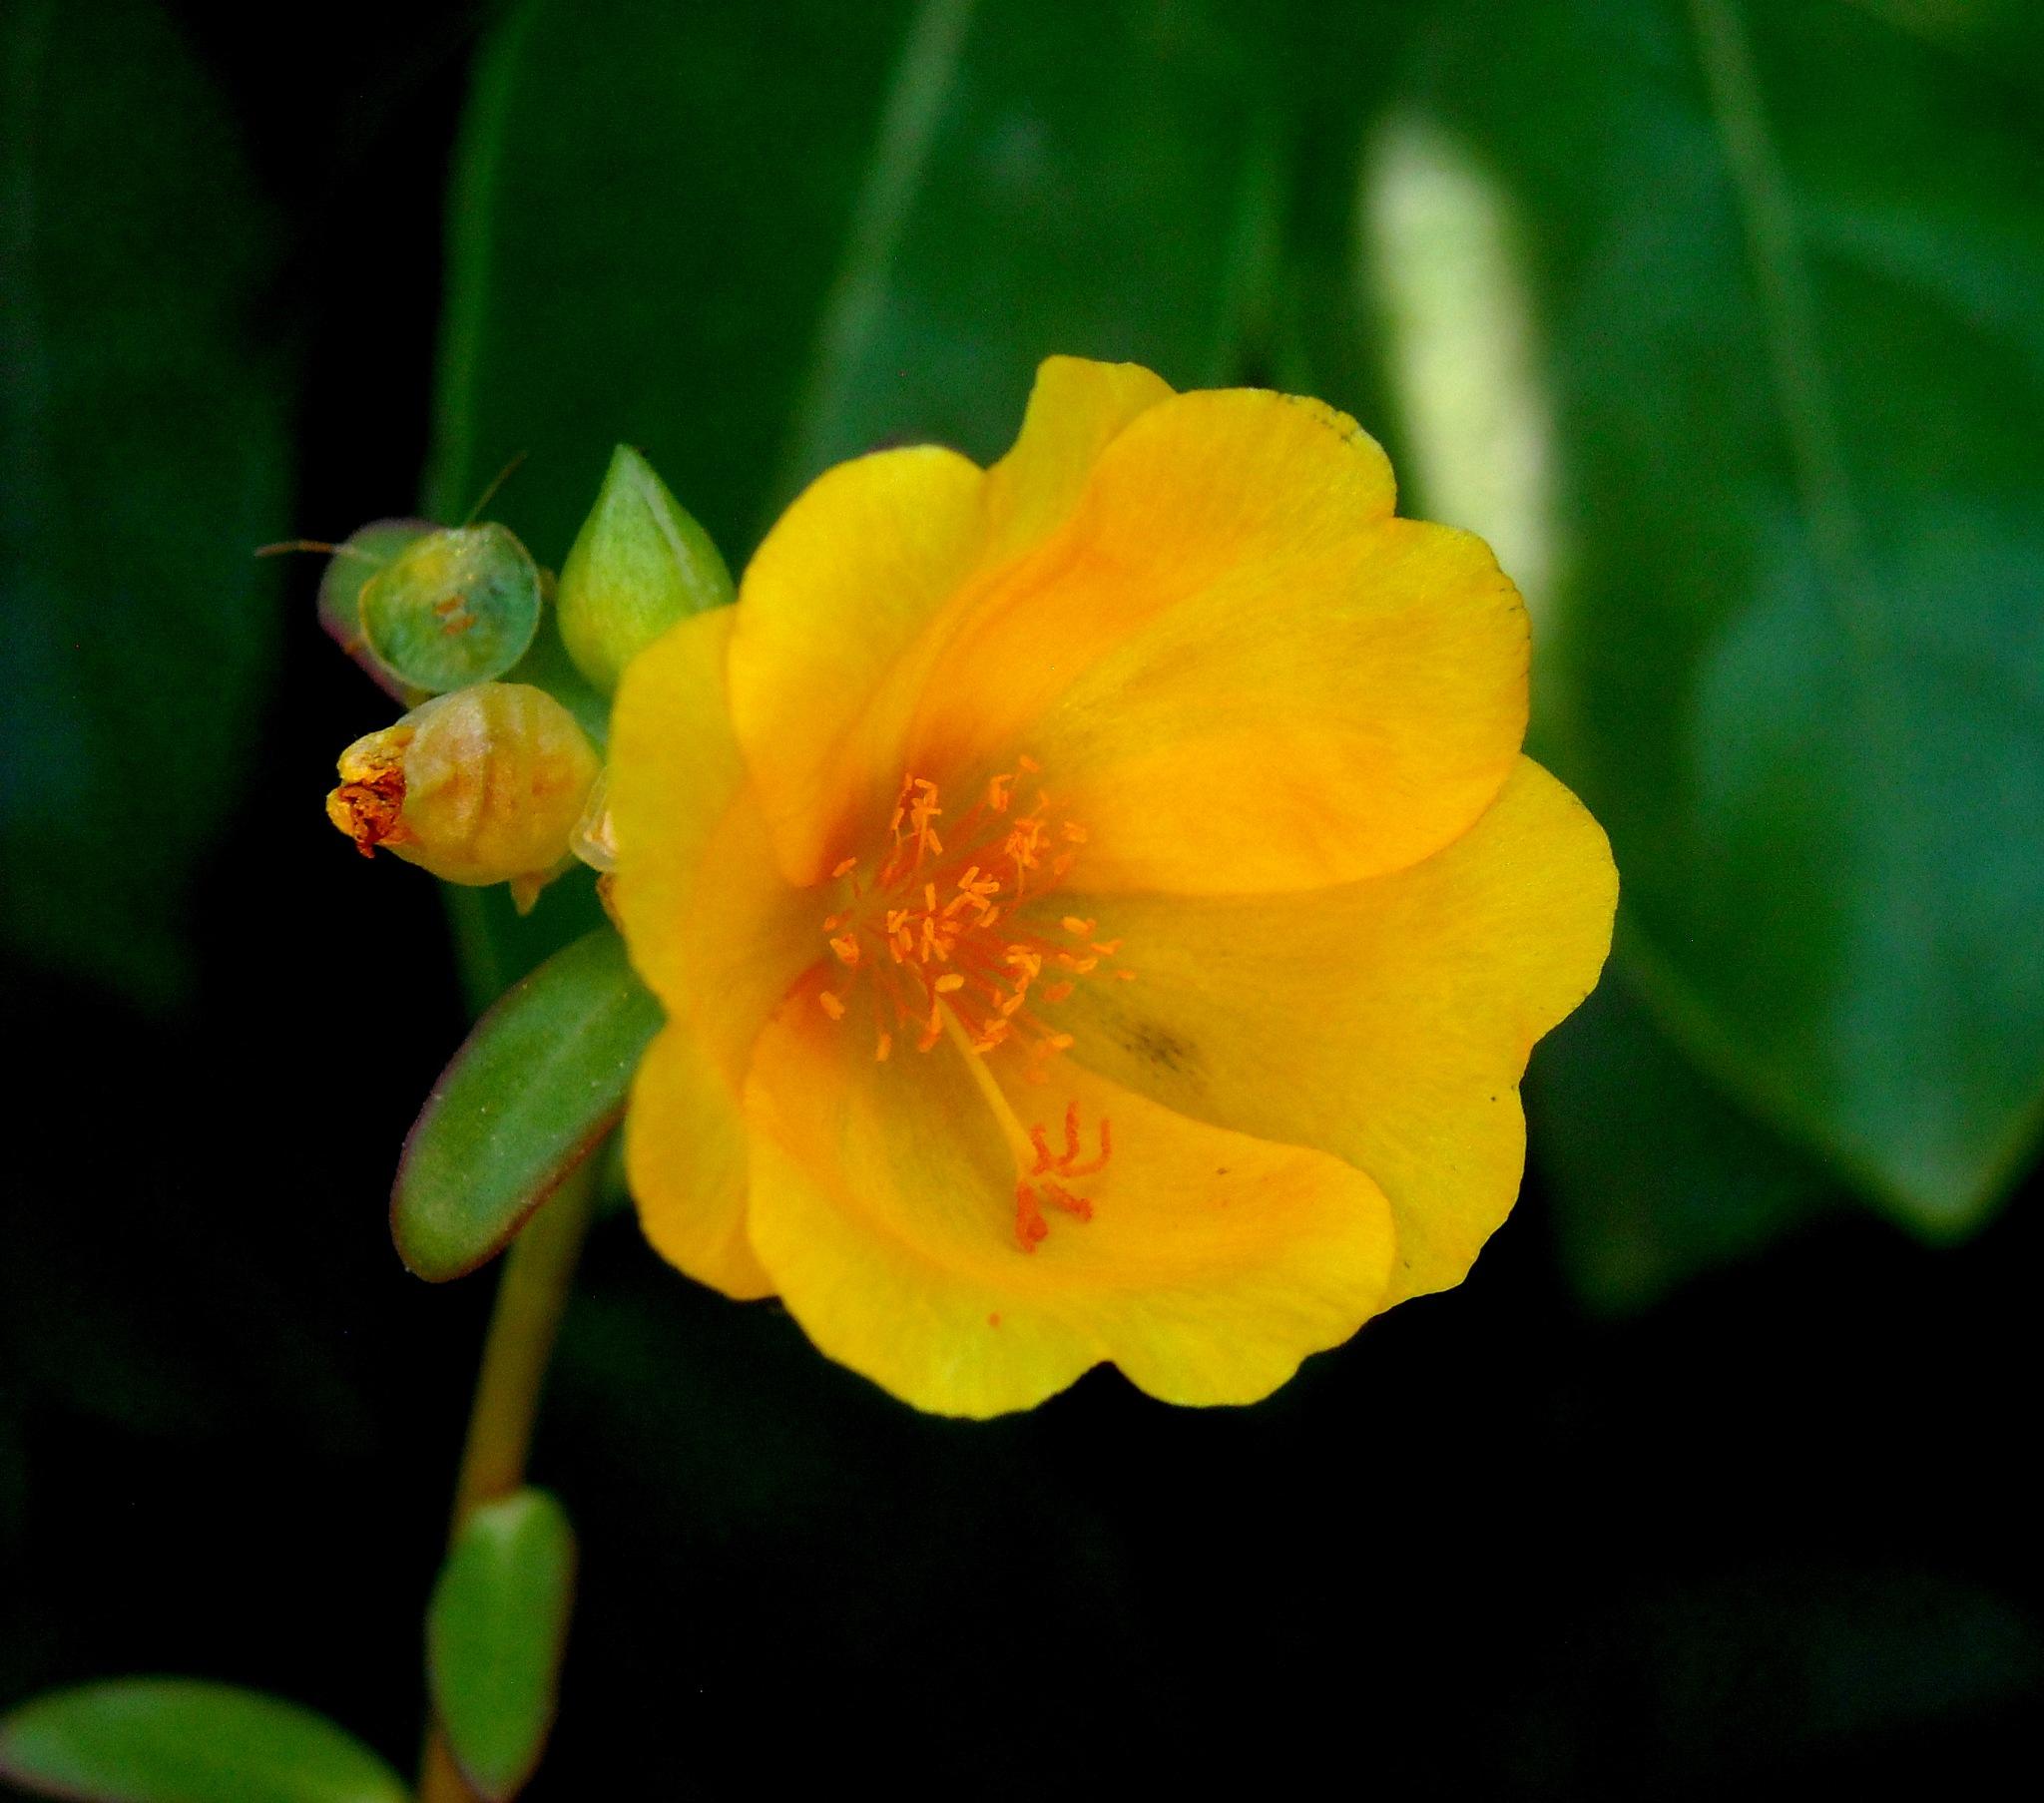 AMAZING FRESH YELLOW FLOWER        by Akin Saner